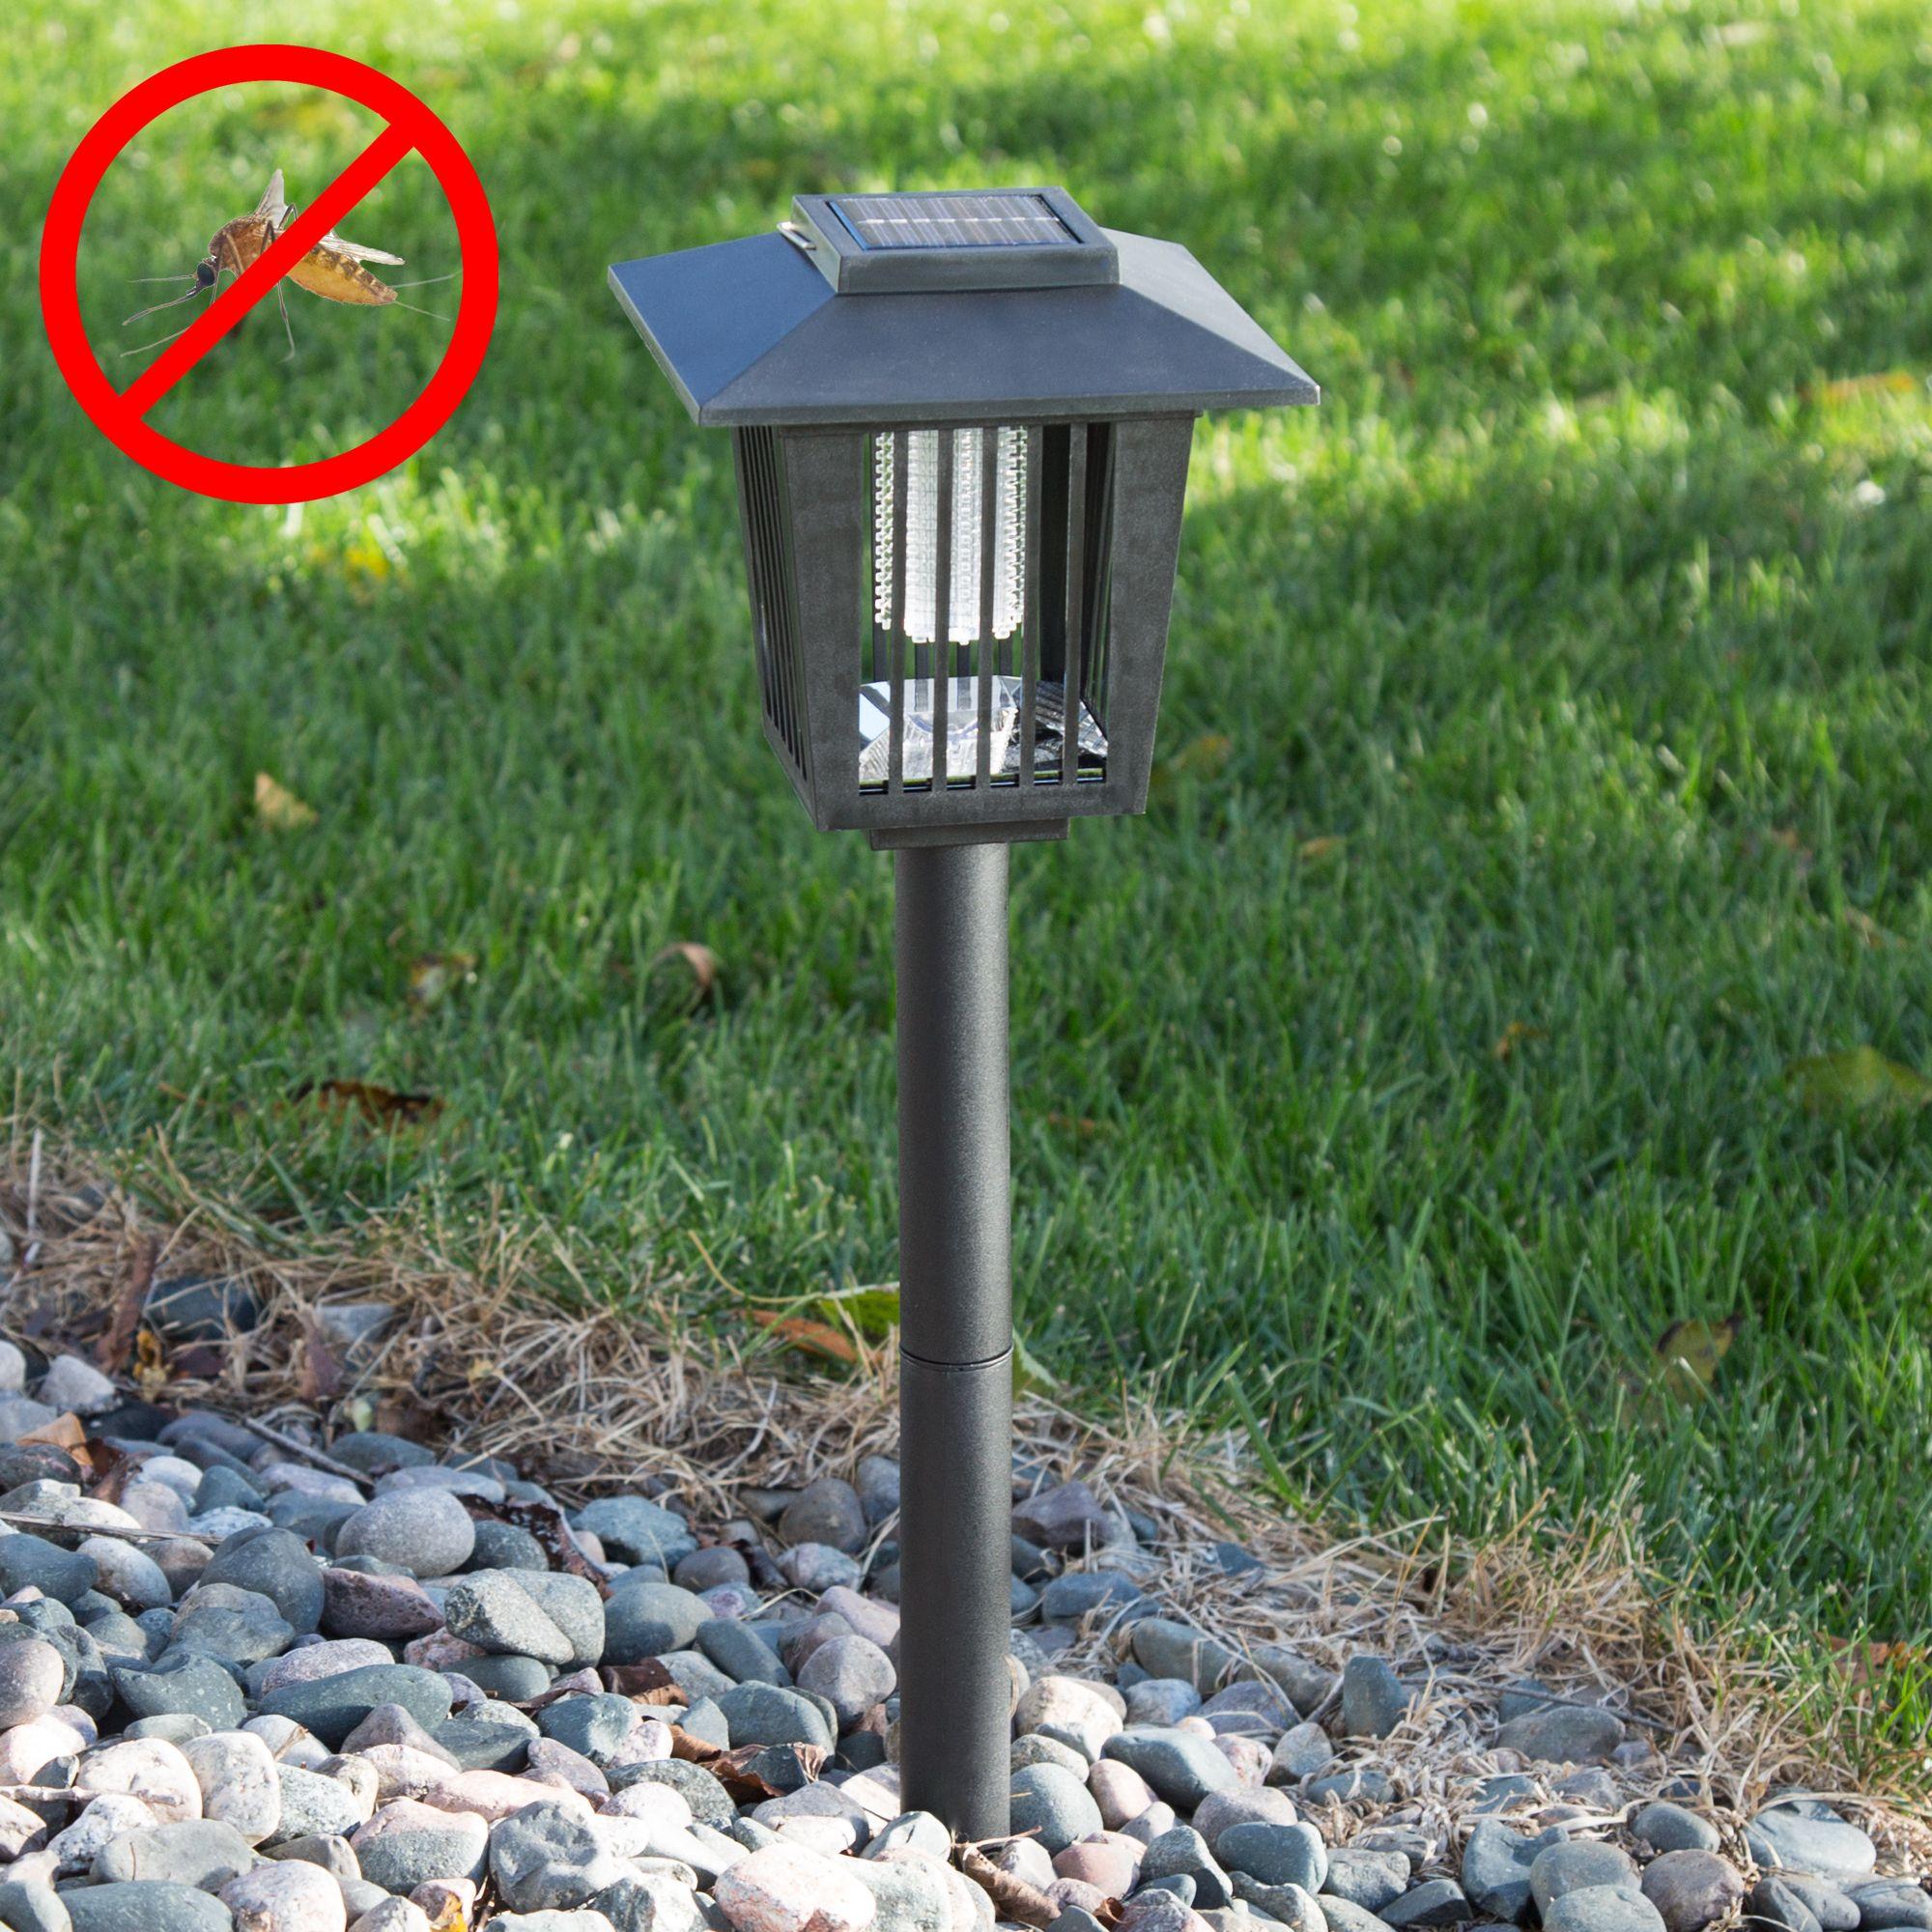 Solar Power Uv Mosquito And Bug Zapper Led Light Black By Pure Garden Walmart Com Pure Garden Bug Zapper Diy Landscaping